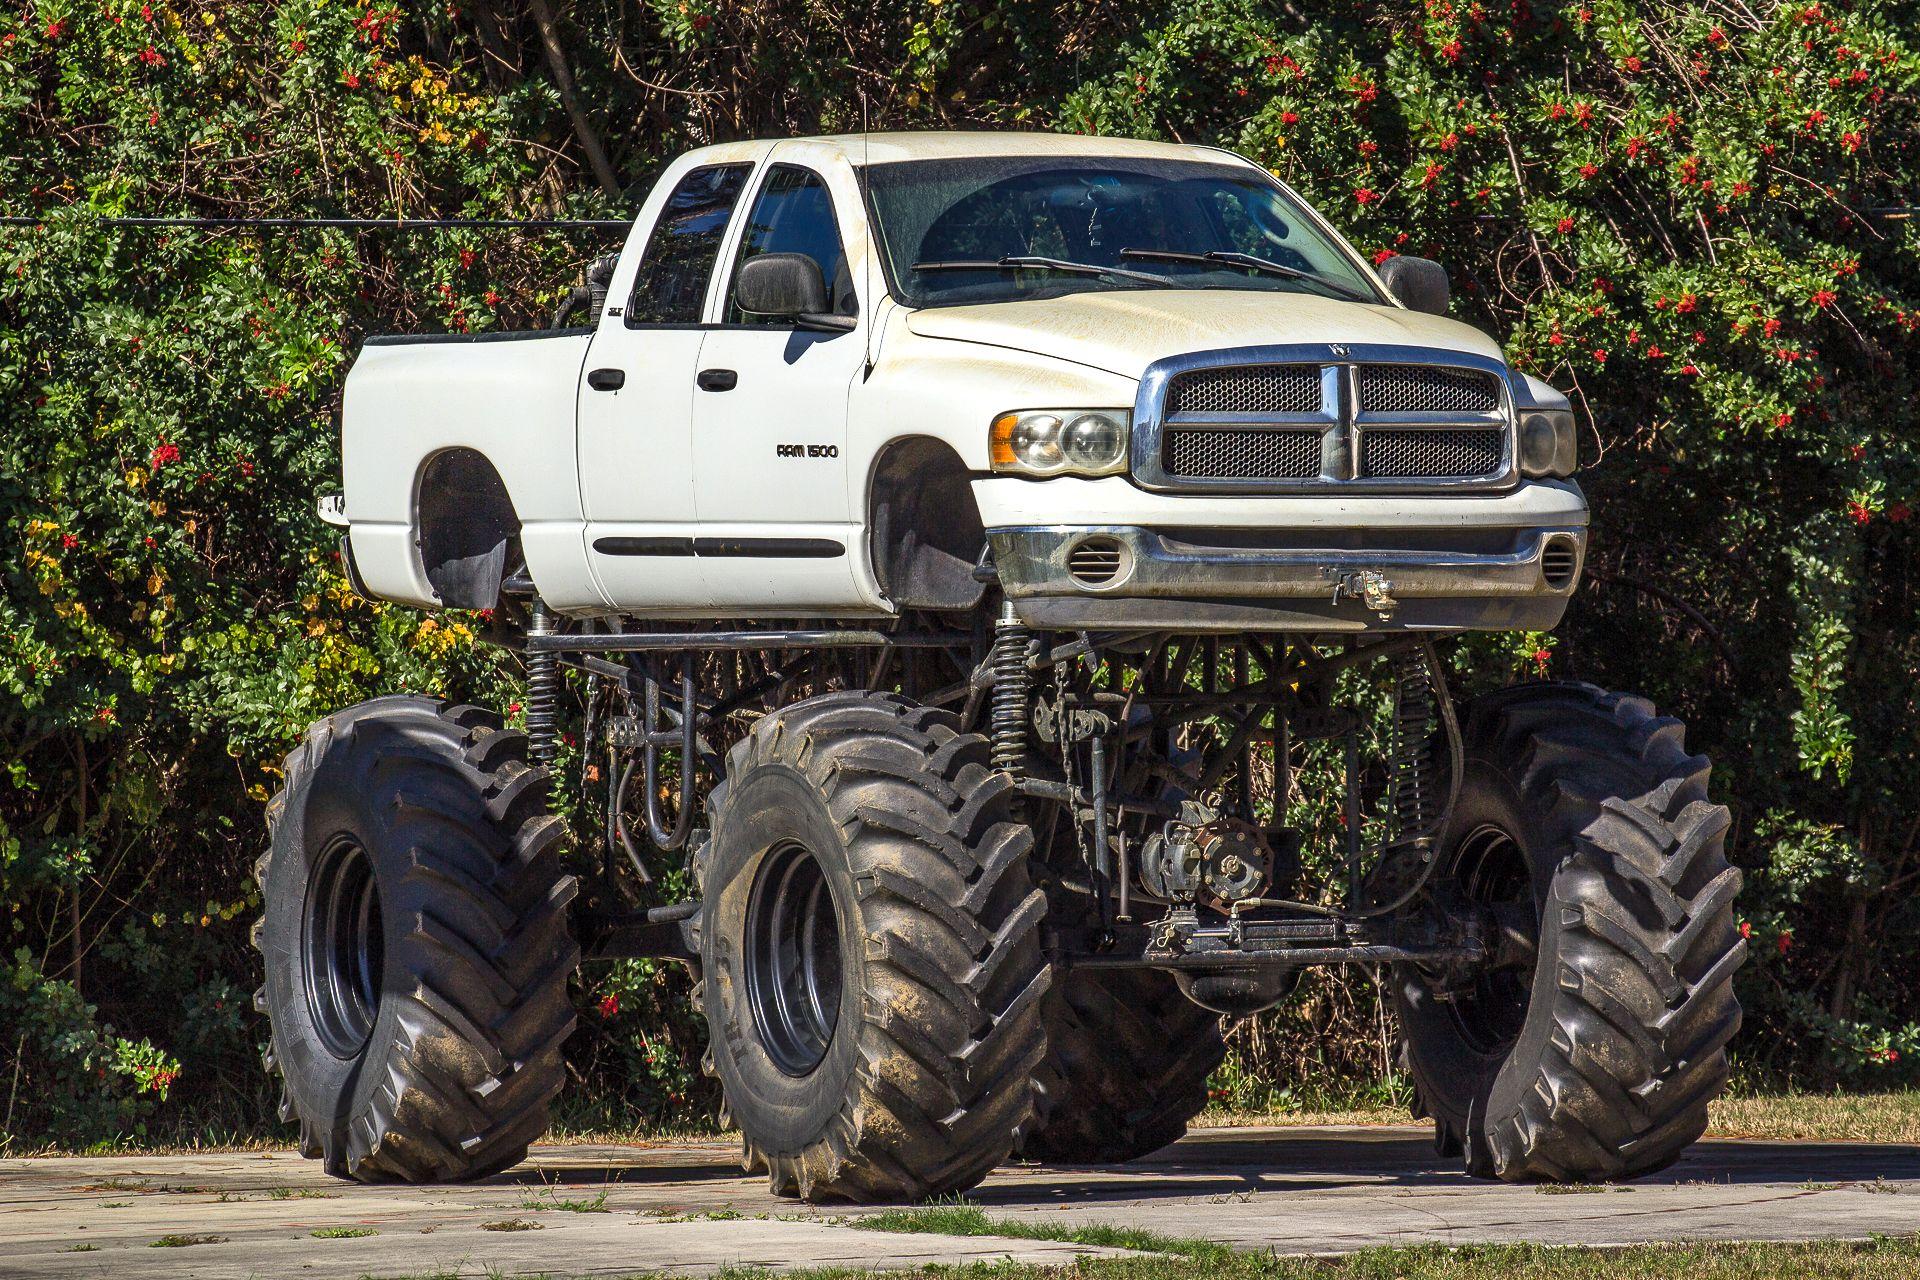 Dodge Ram Trucks Trucks Dodge Trucks Ram Dodge Truck